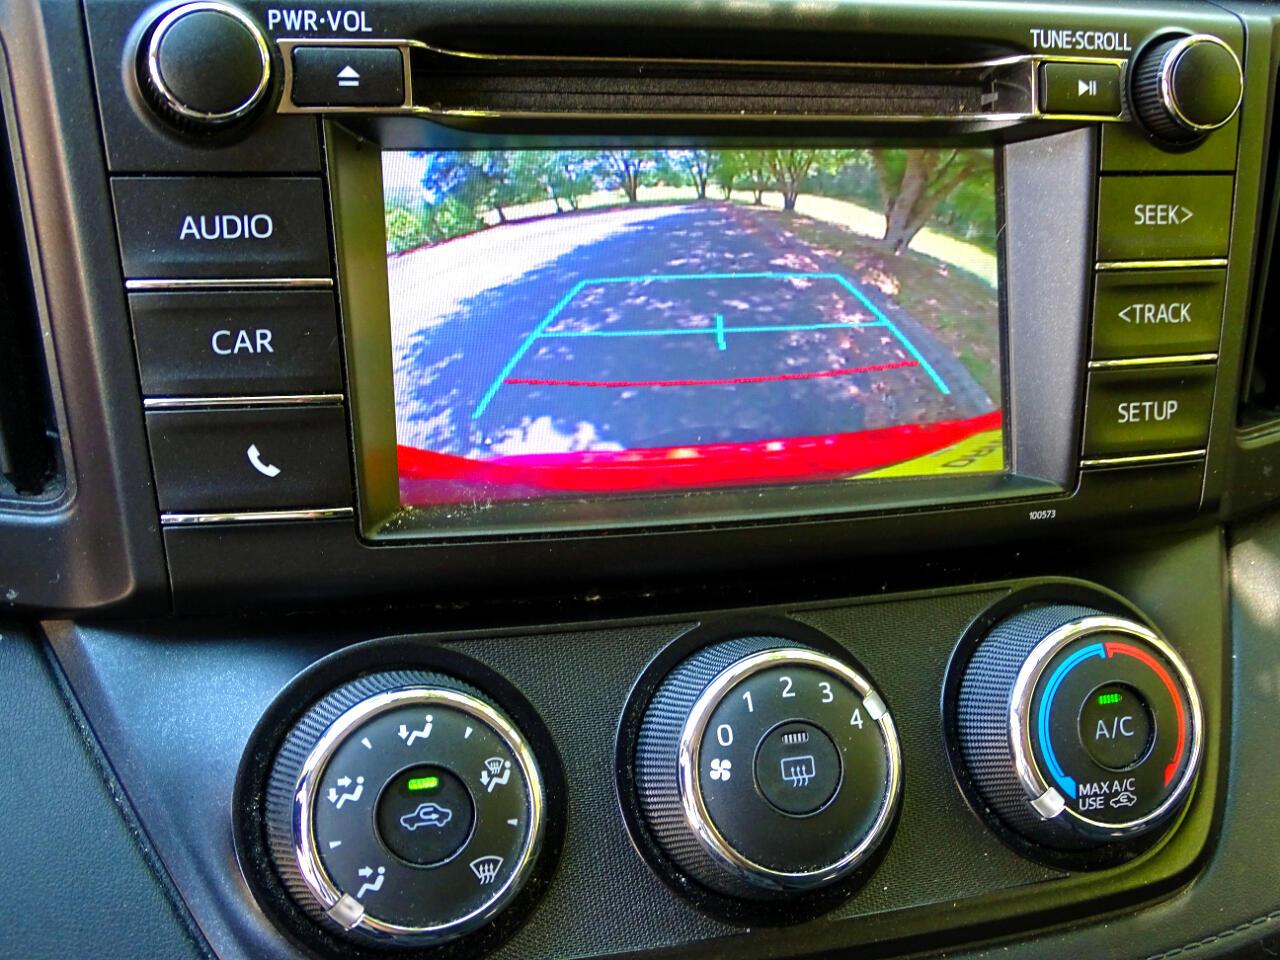 2016 Toyota RAV4 FWD 4dr LE (Natl)